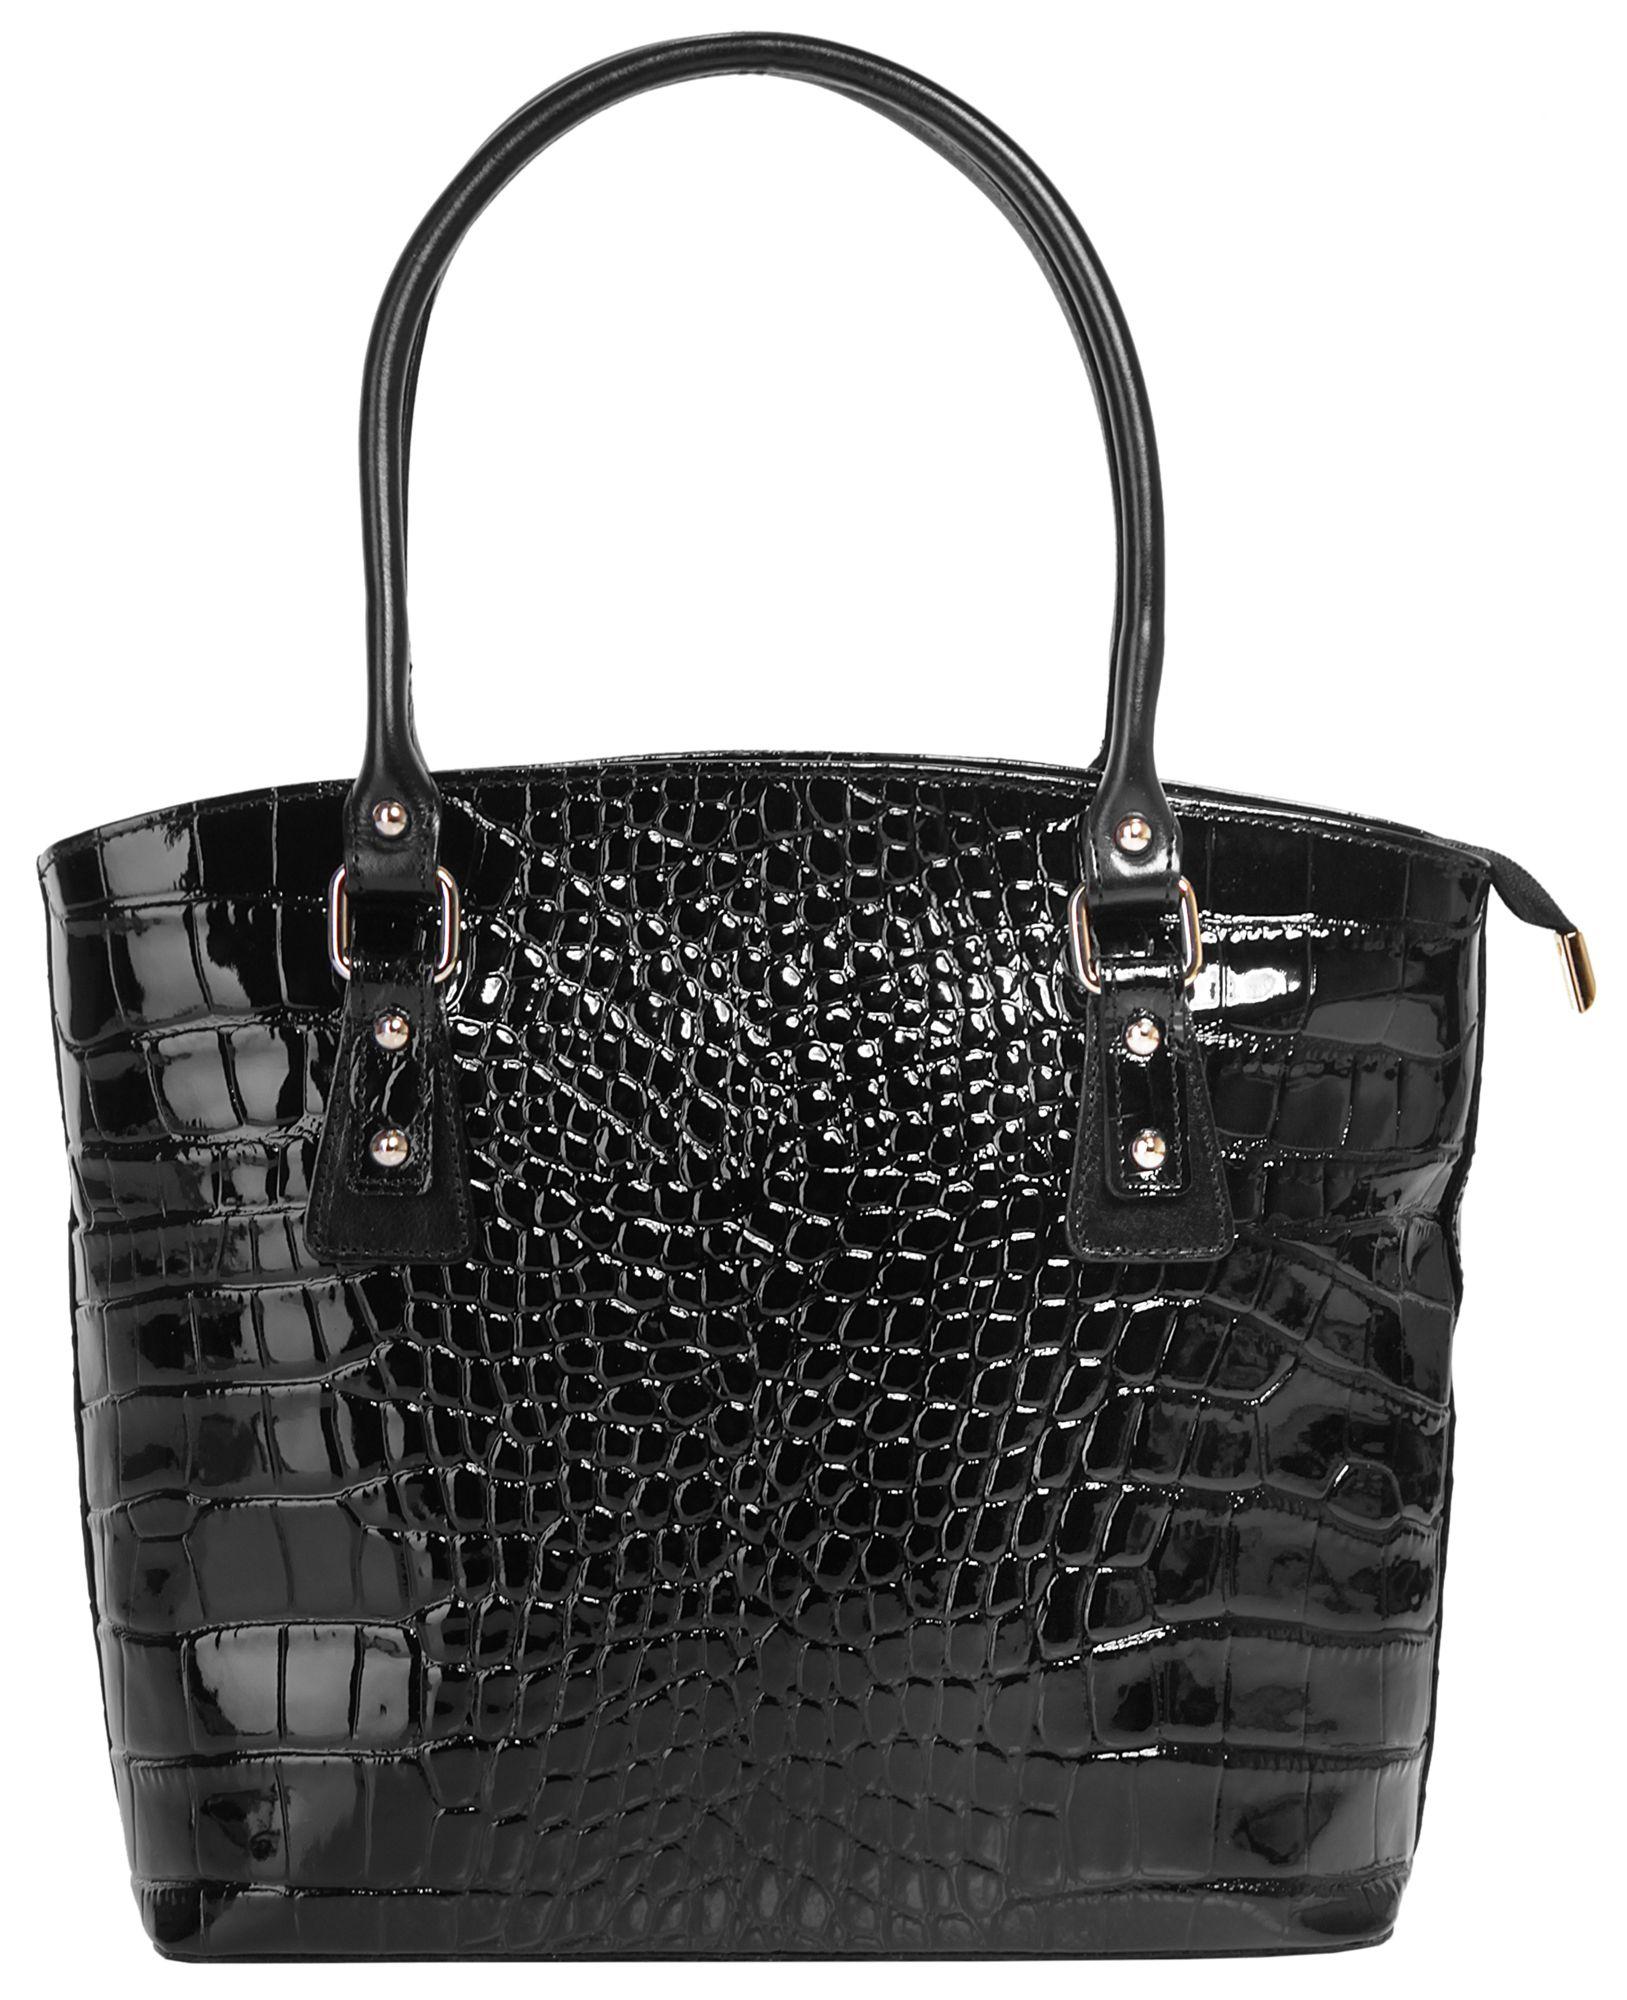 CLUTY Cluty Leder Damen Handtasche mit Croco-Prägung